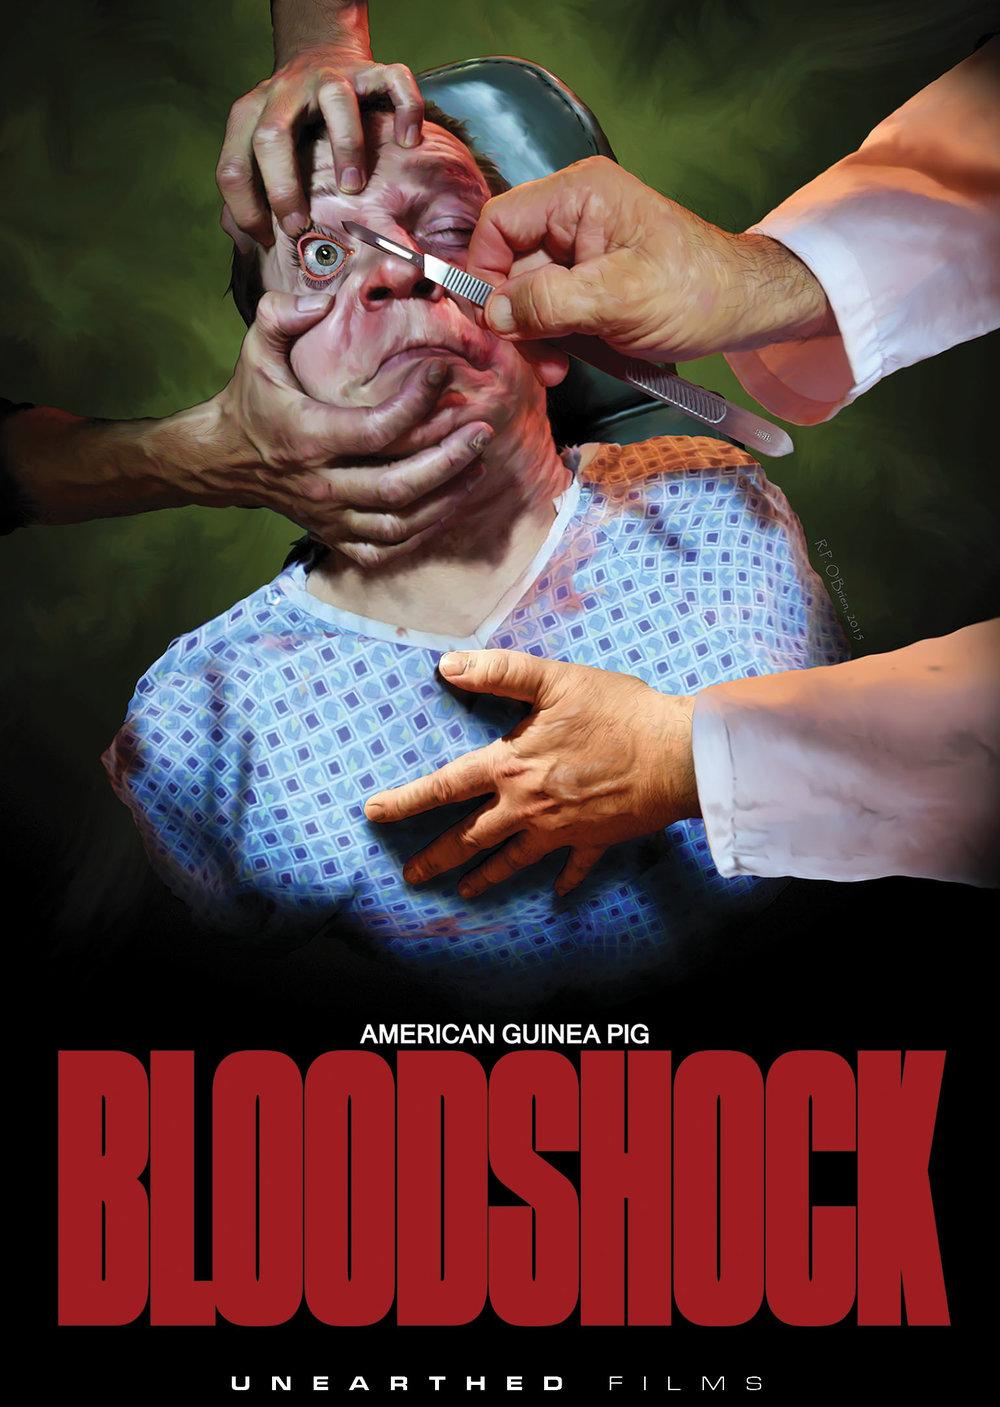 bloodshock.jpg